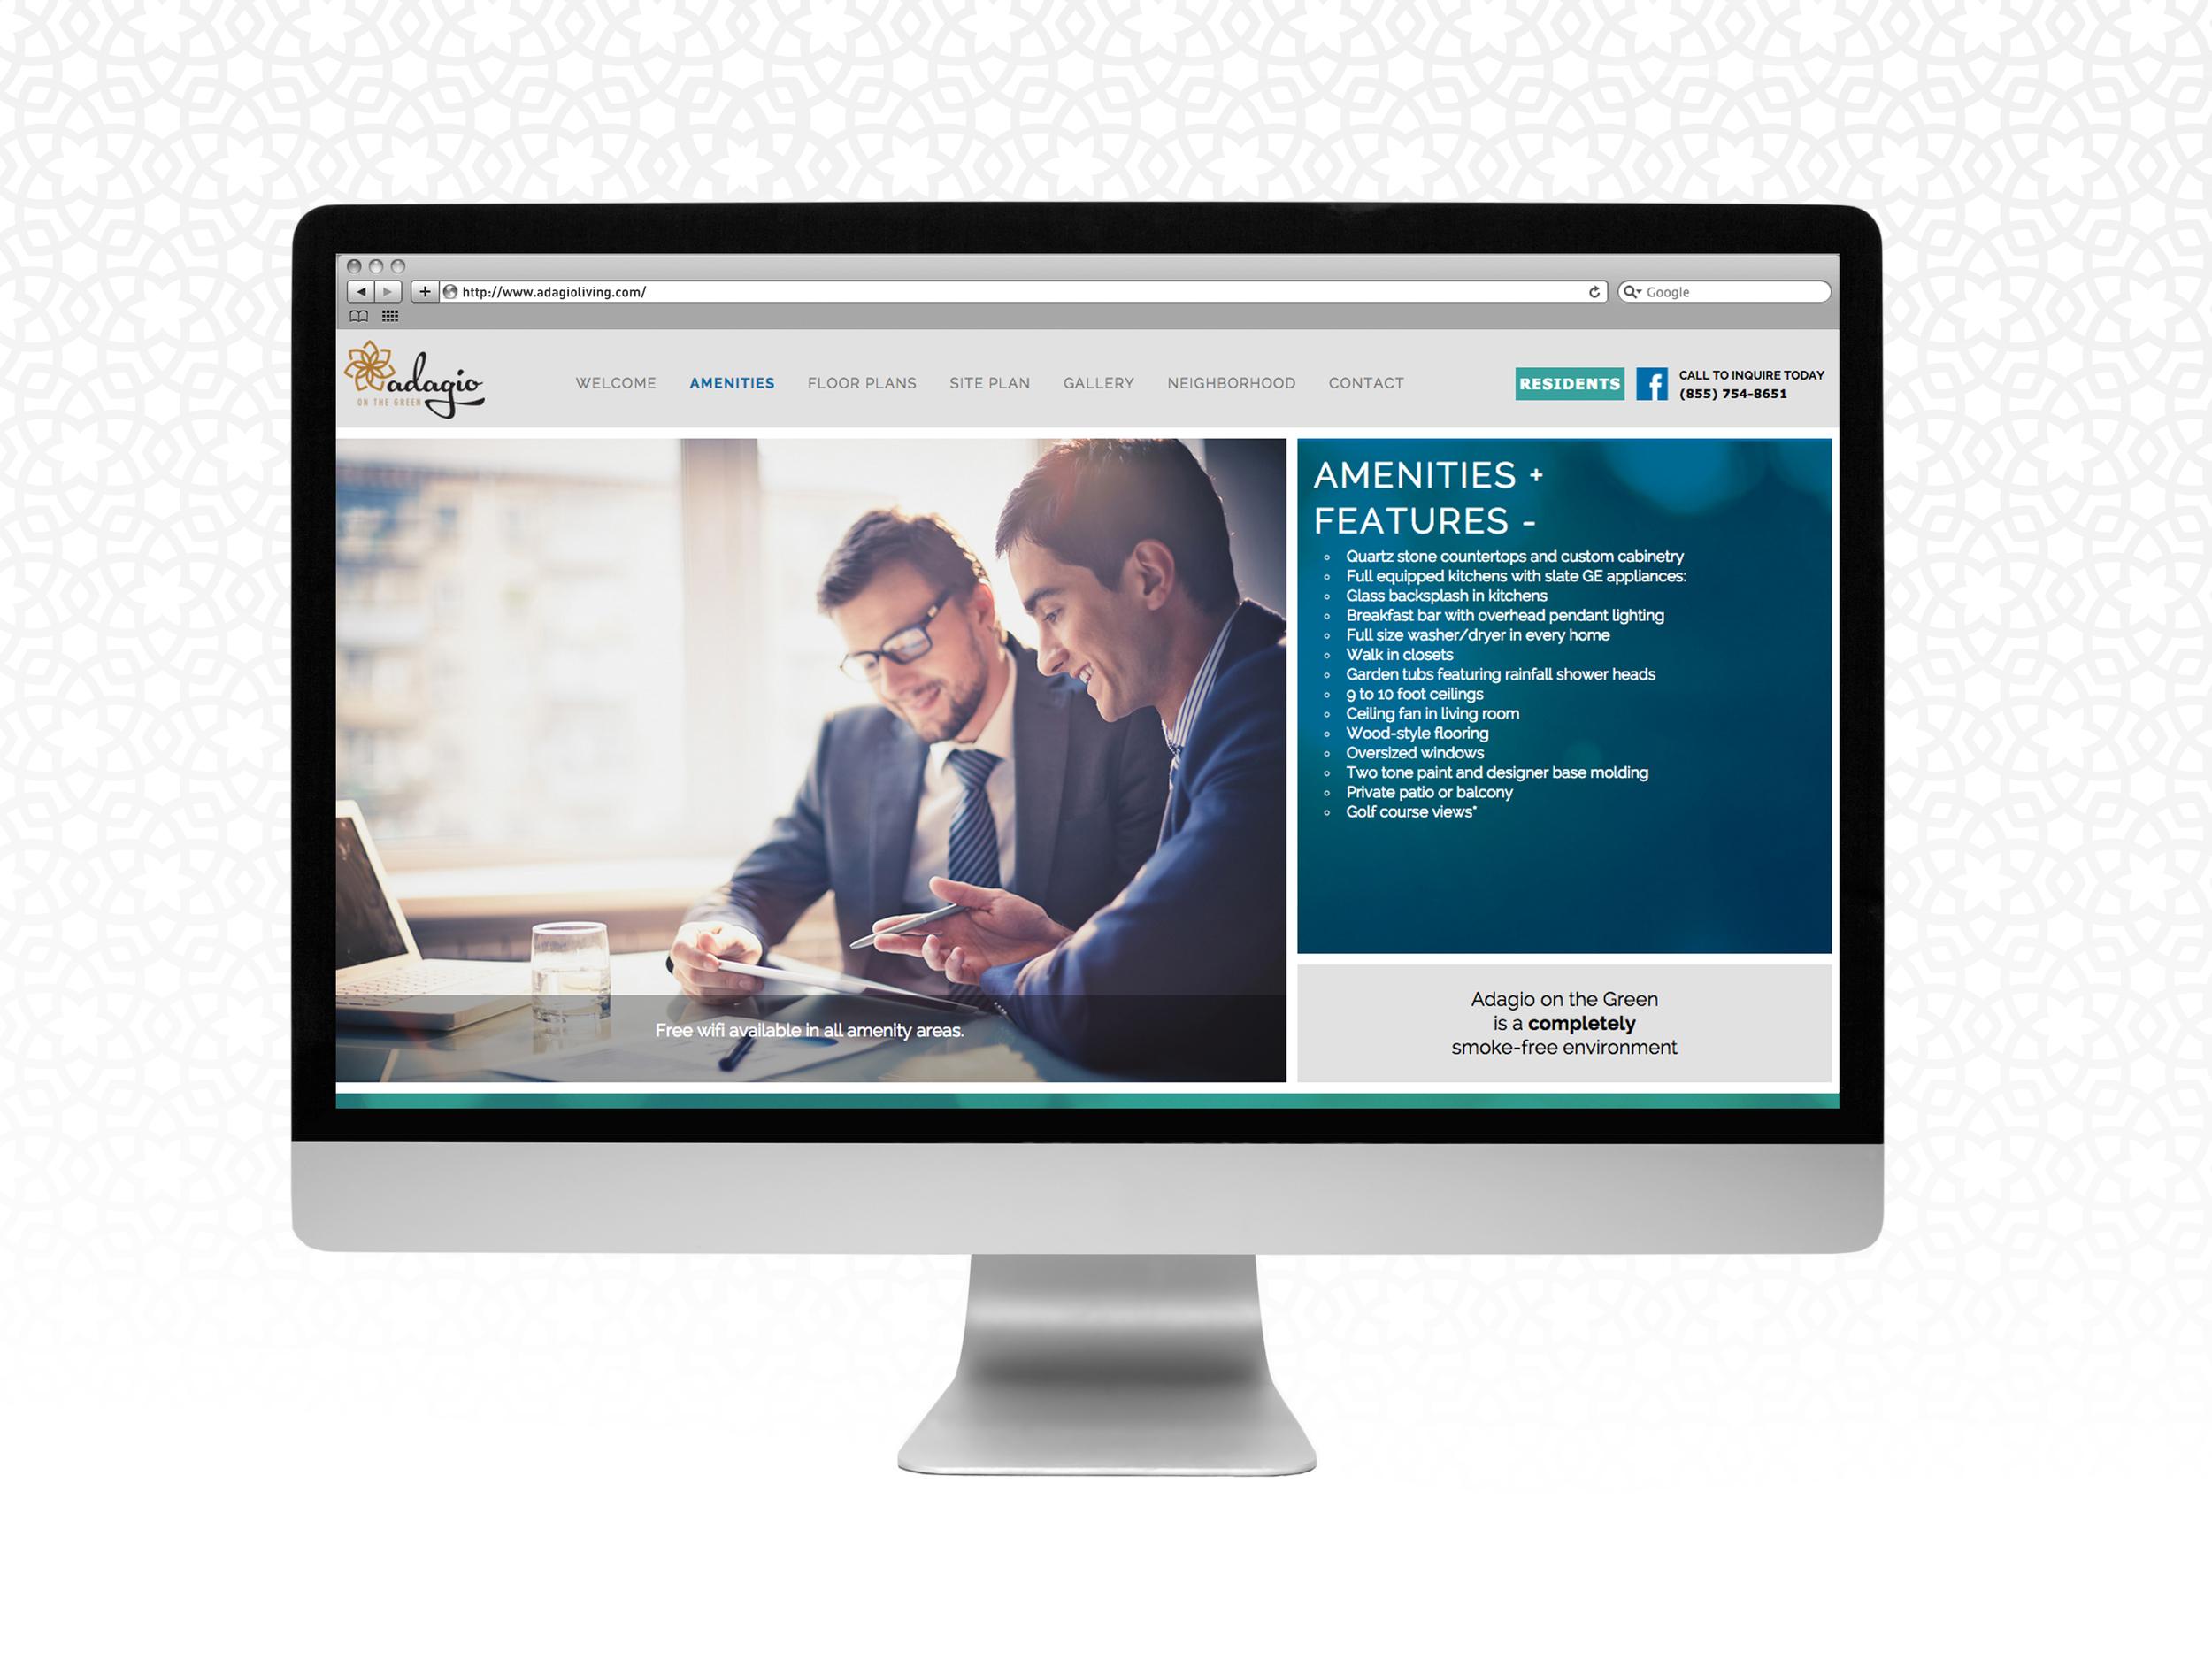 1185 Adagio WebsiteUpdate Desktop 0515_hmv1-02.jpg